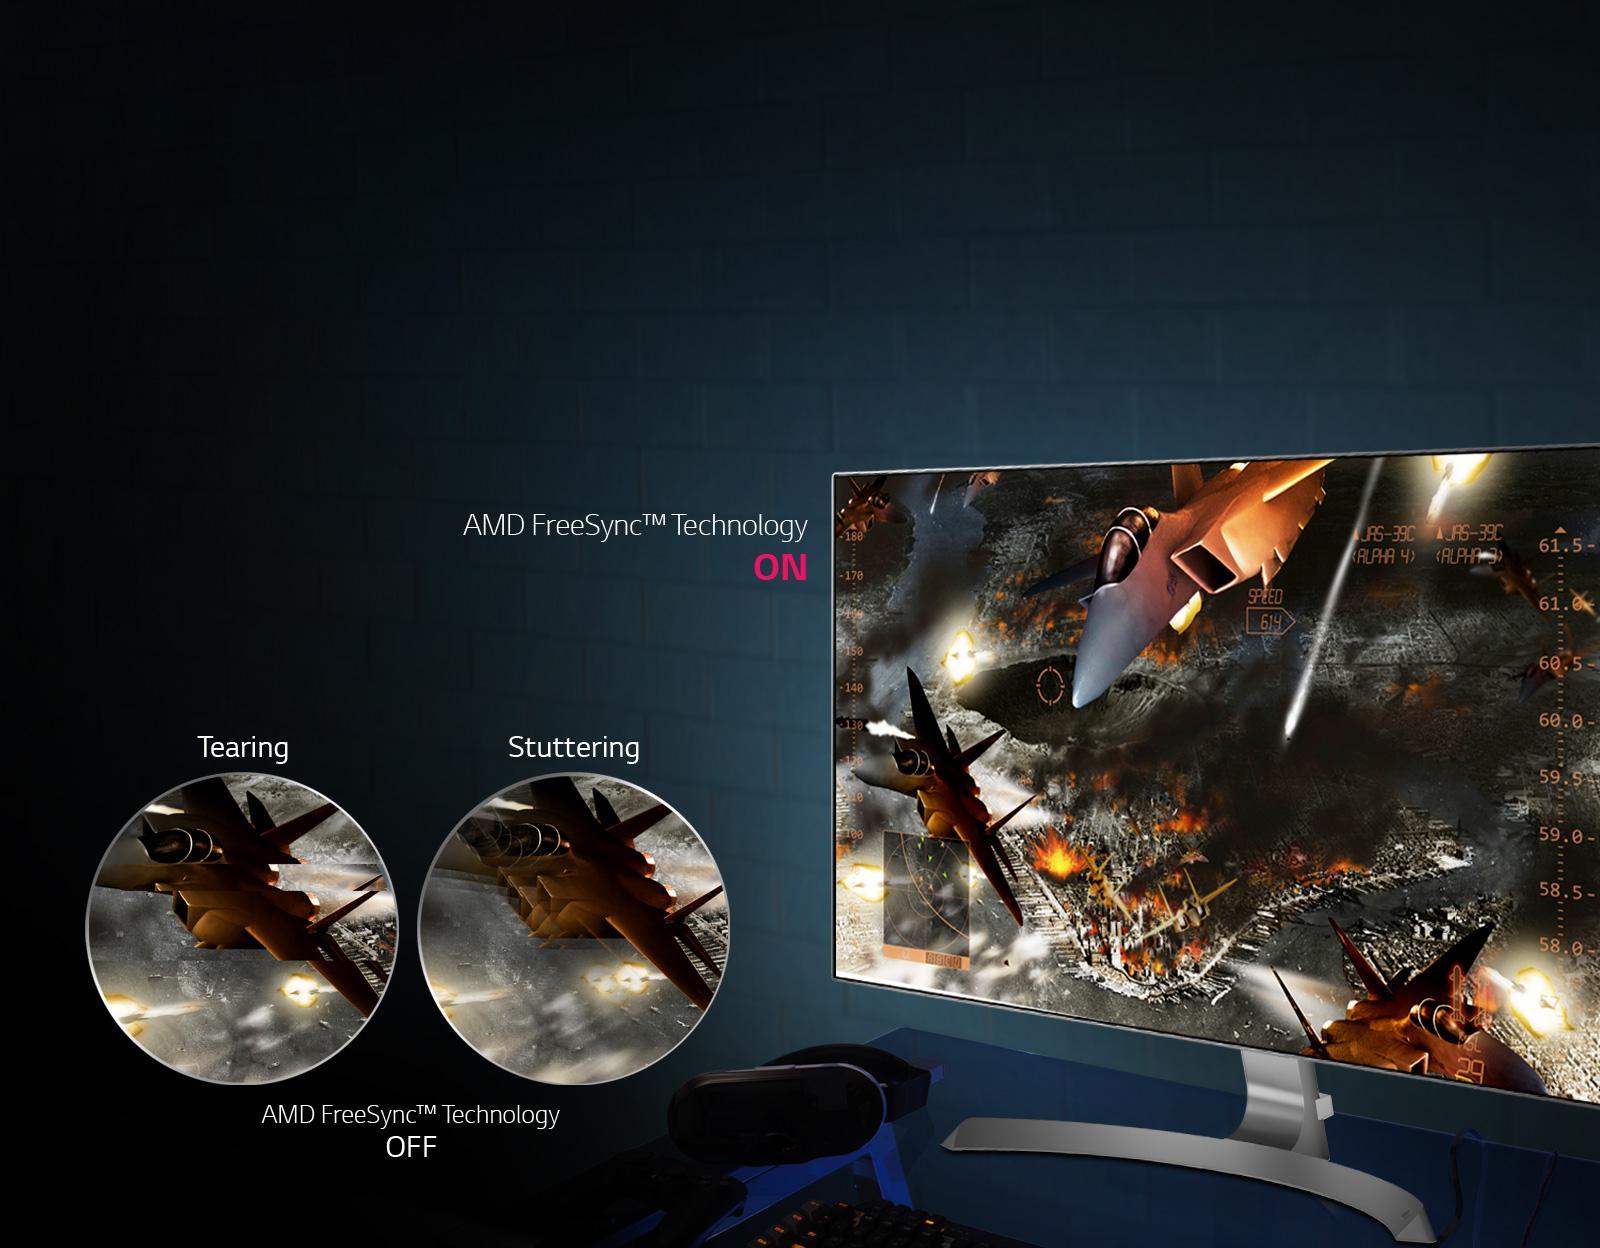 AMD FreeSync Technology 27MP89HM-S